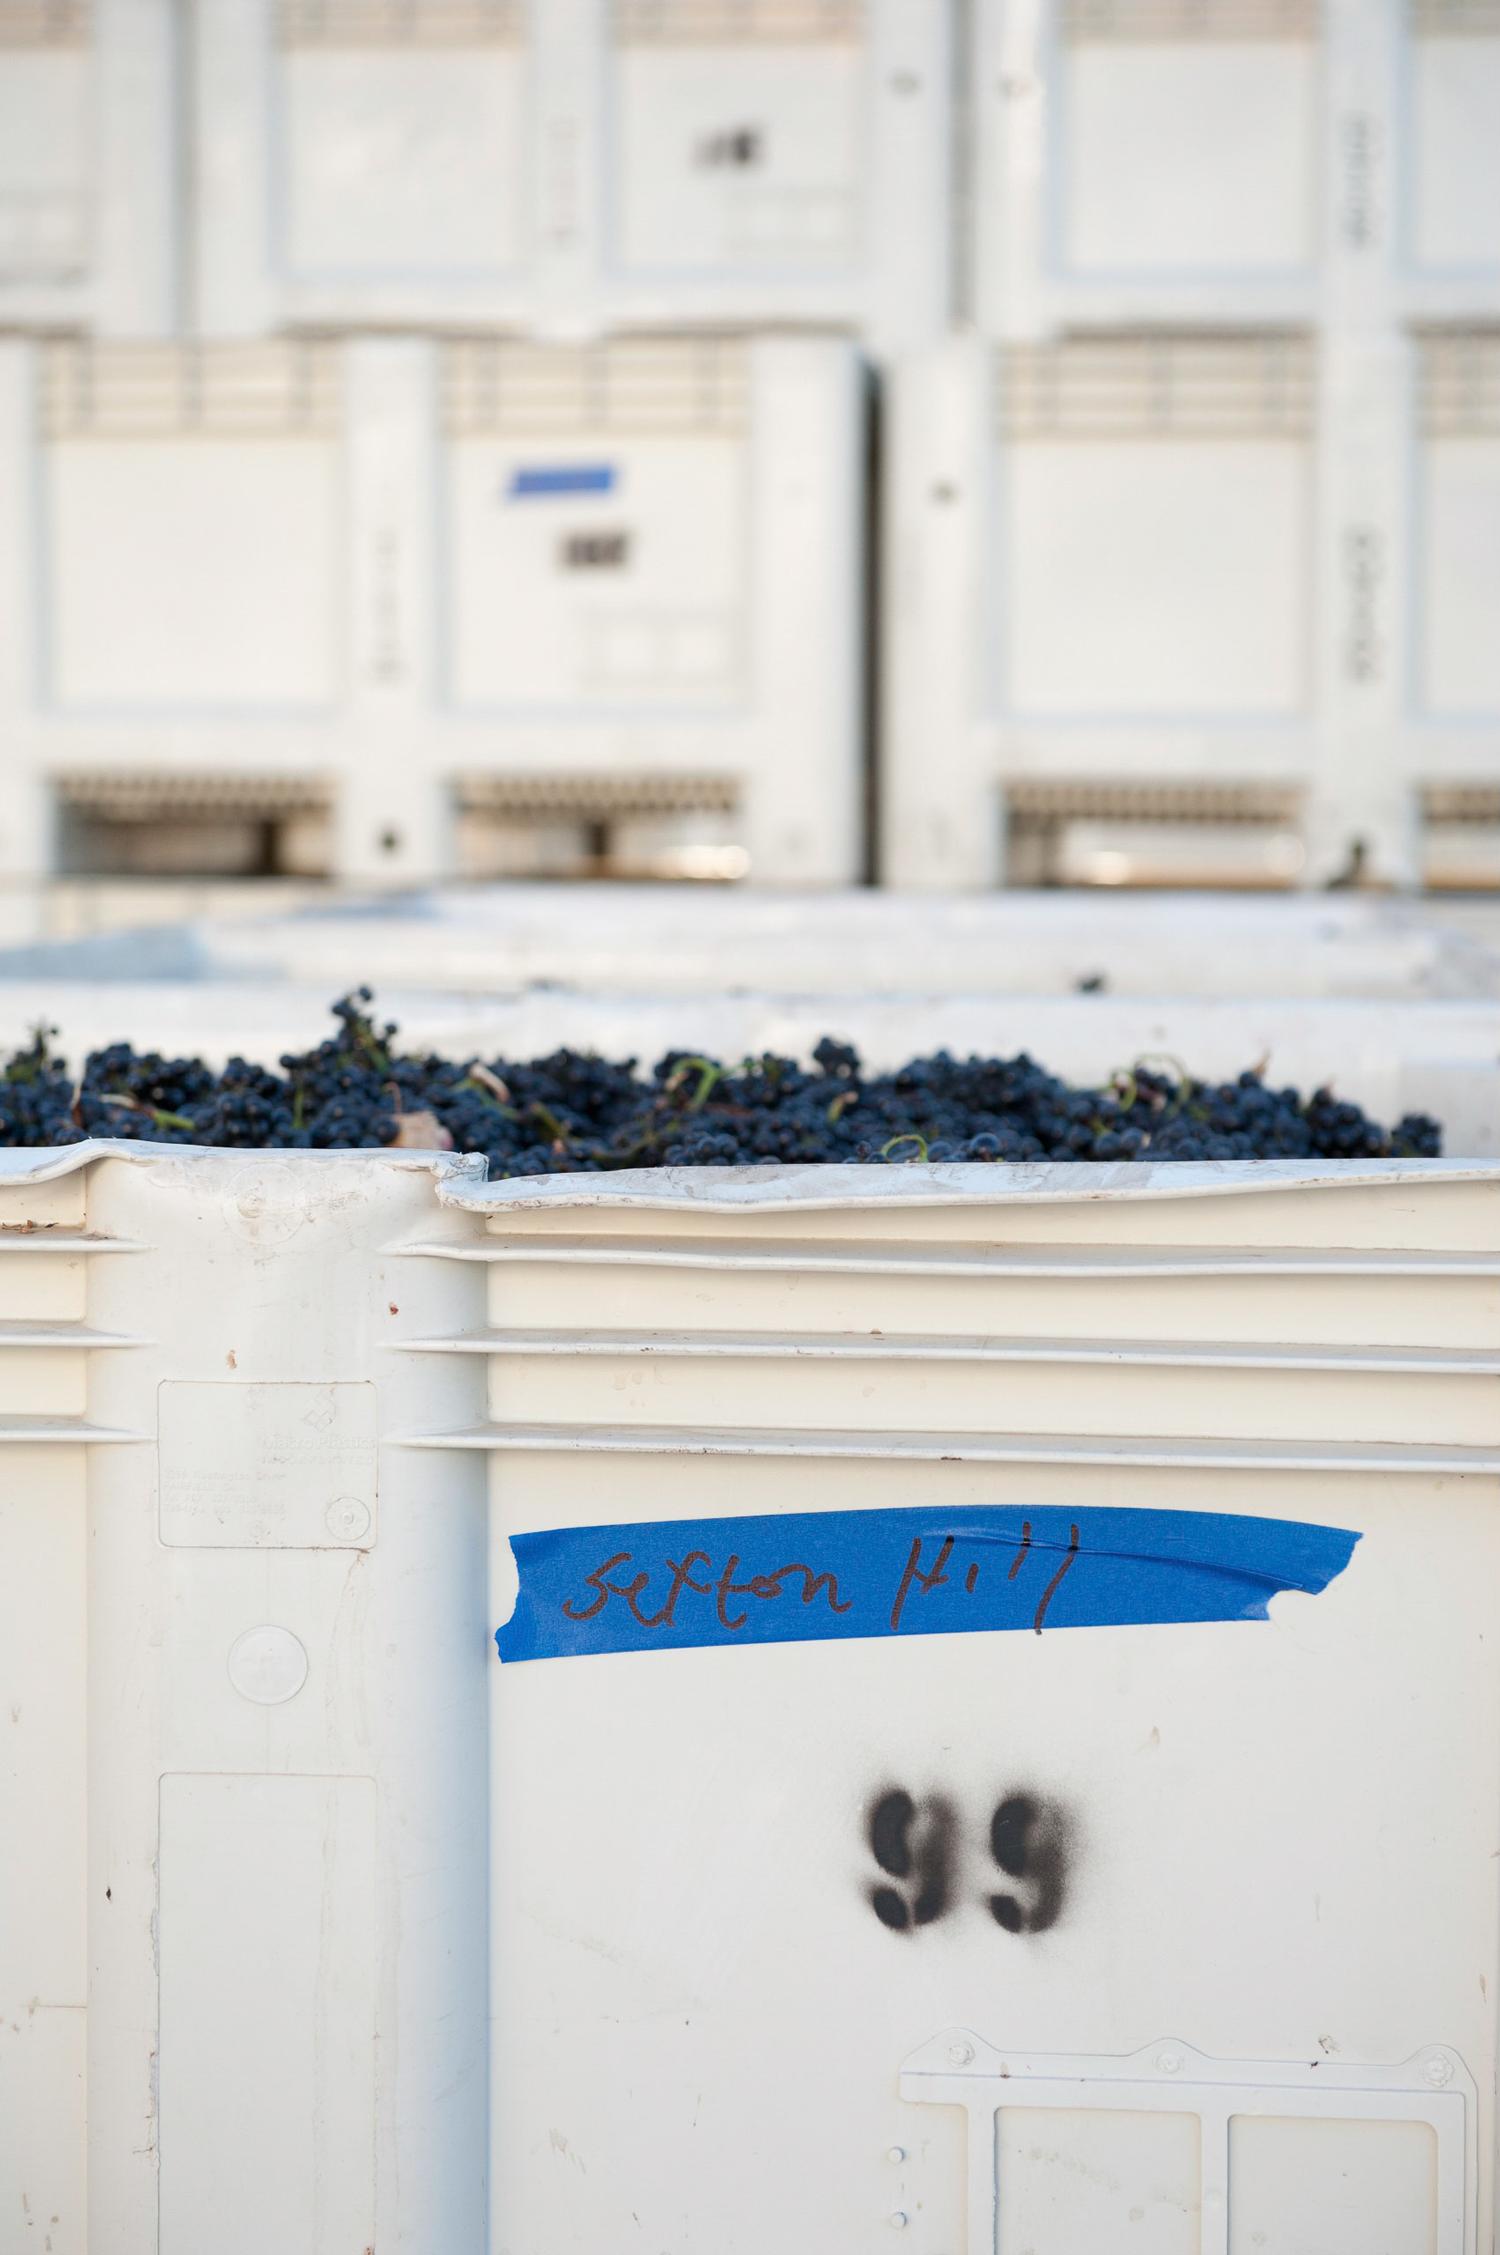 Sexton_Hill_Pinot_noir_grapes_in_bin.png